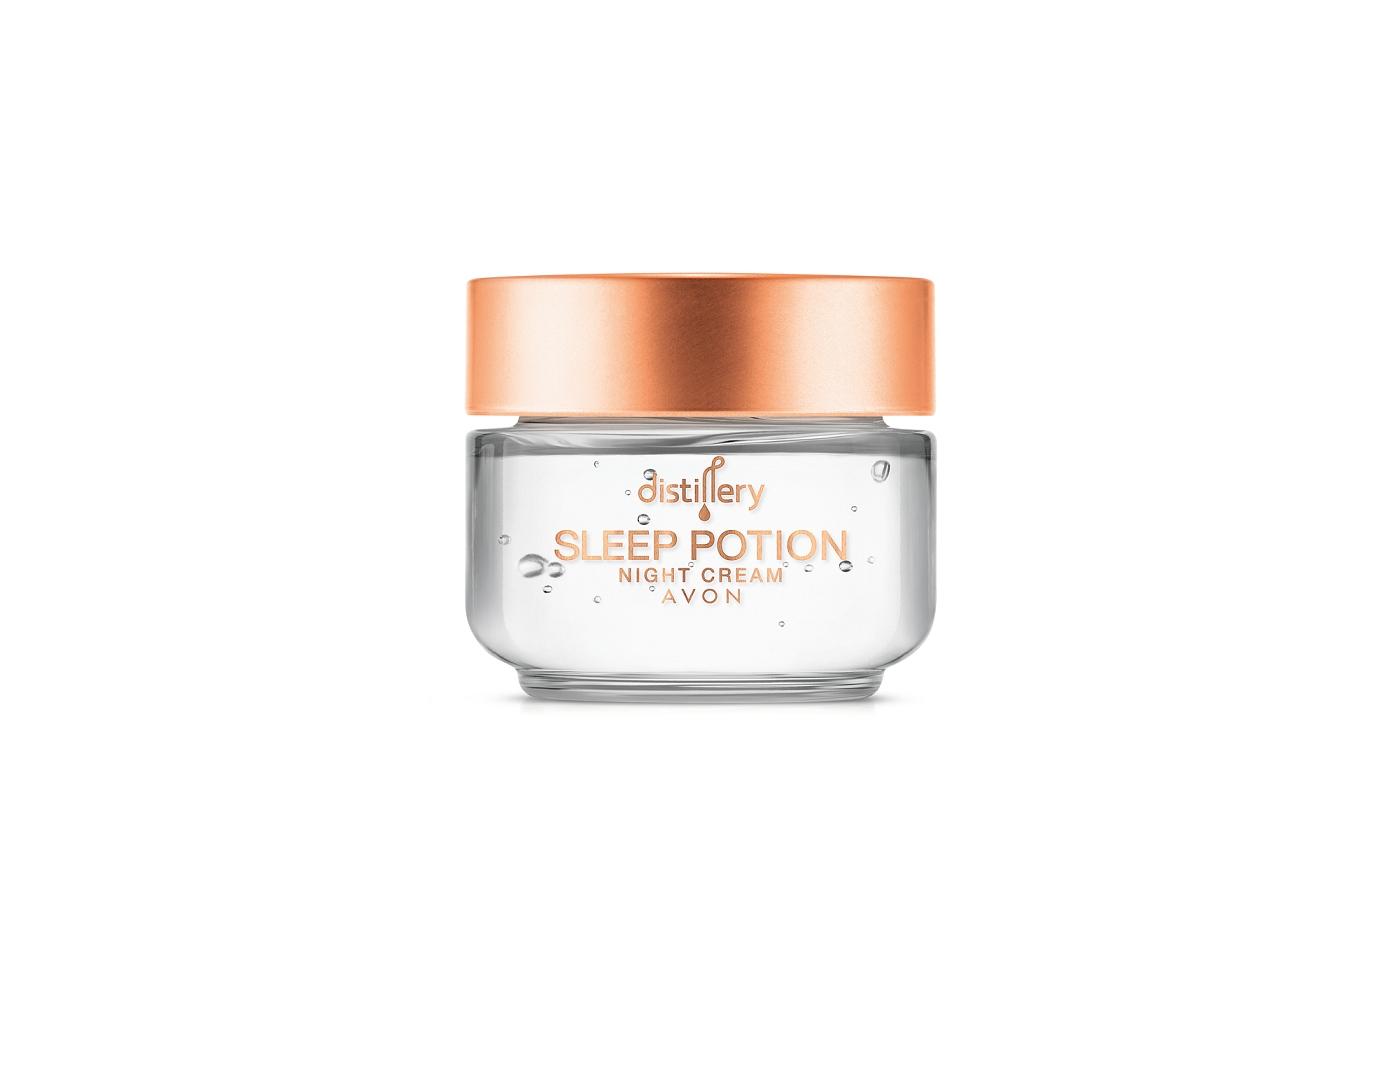 Sleep Potion noćna krema 2500 din Čista lepota osvaja beauty industriju